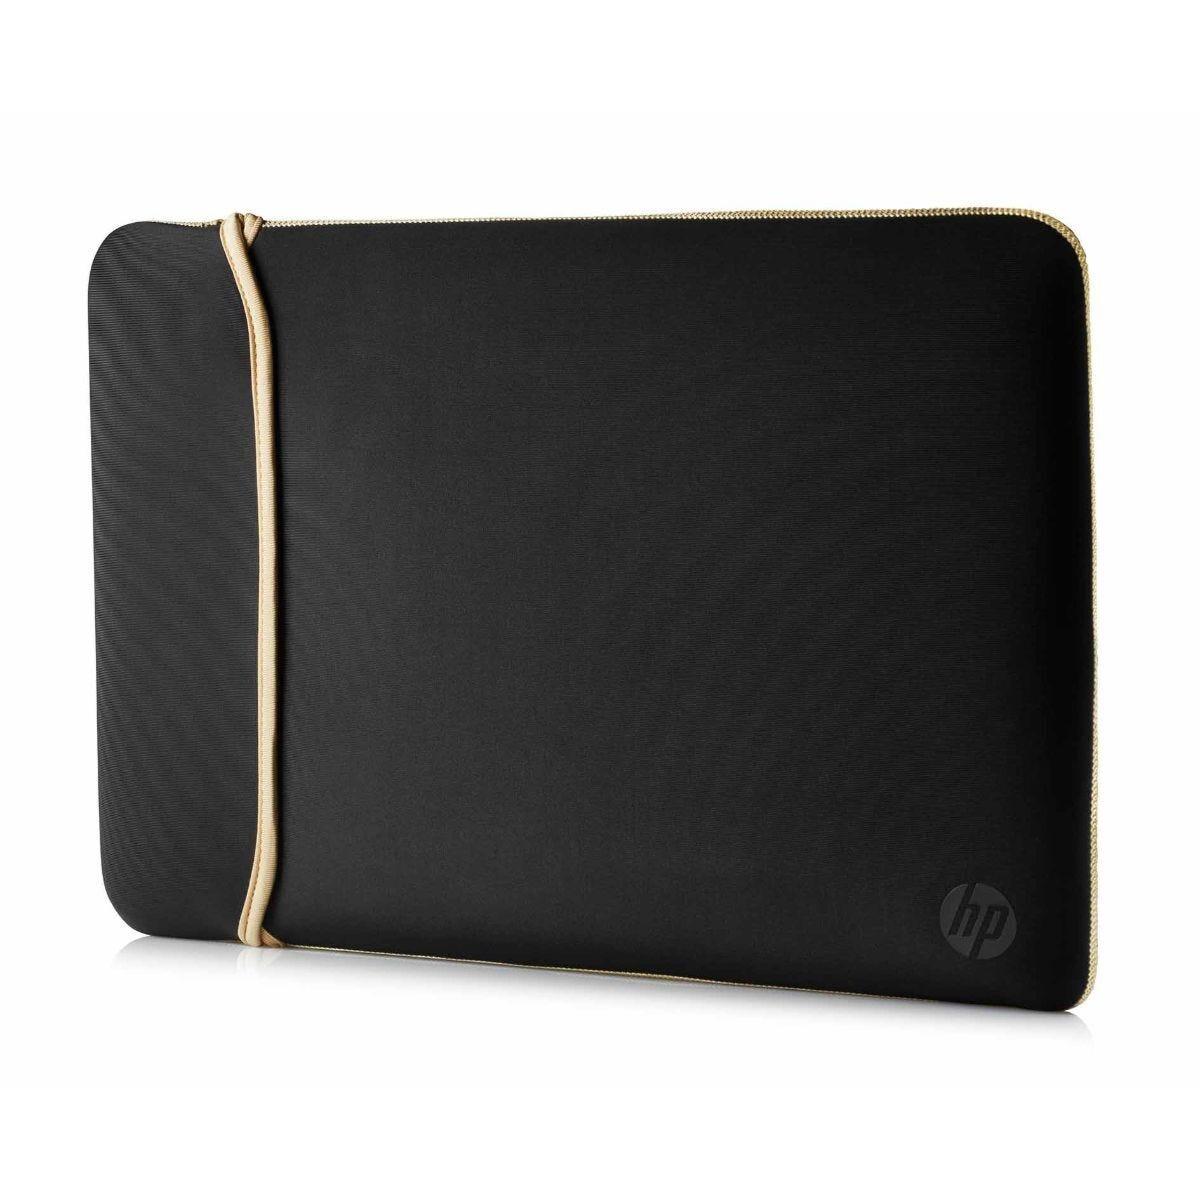 HP Neoprene 15 Inch Reversible Laptop Sleeve - Black and Gold